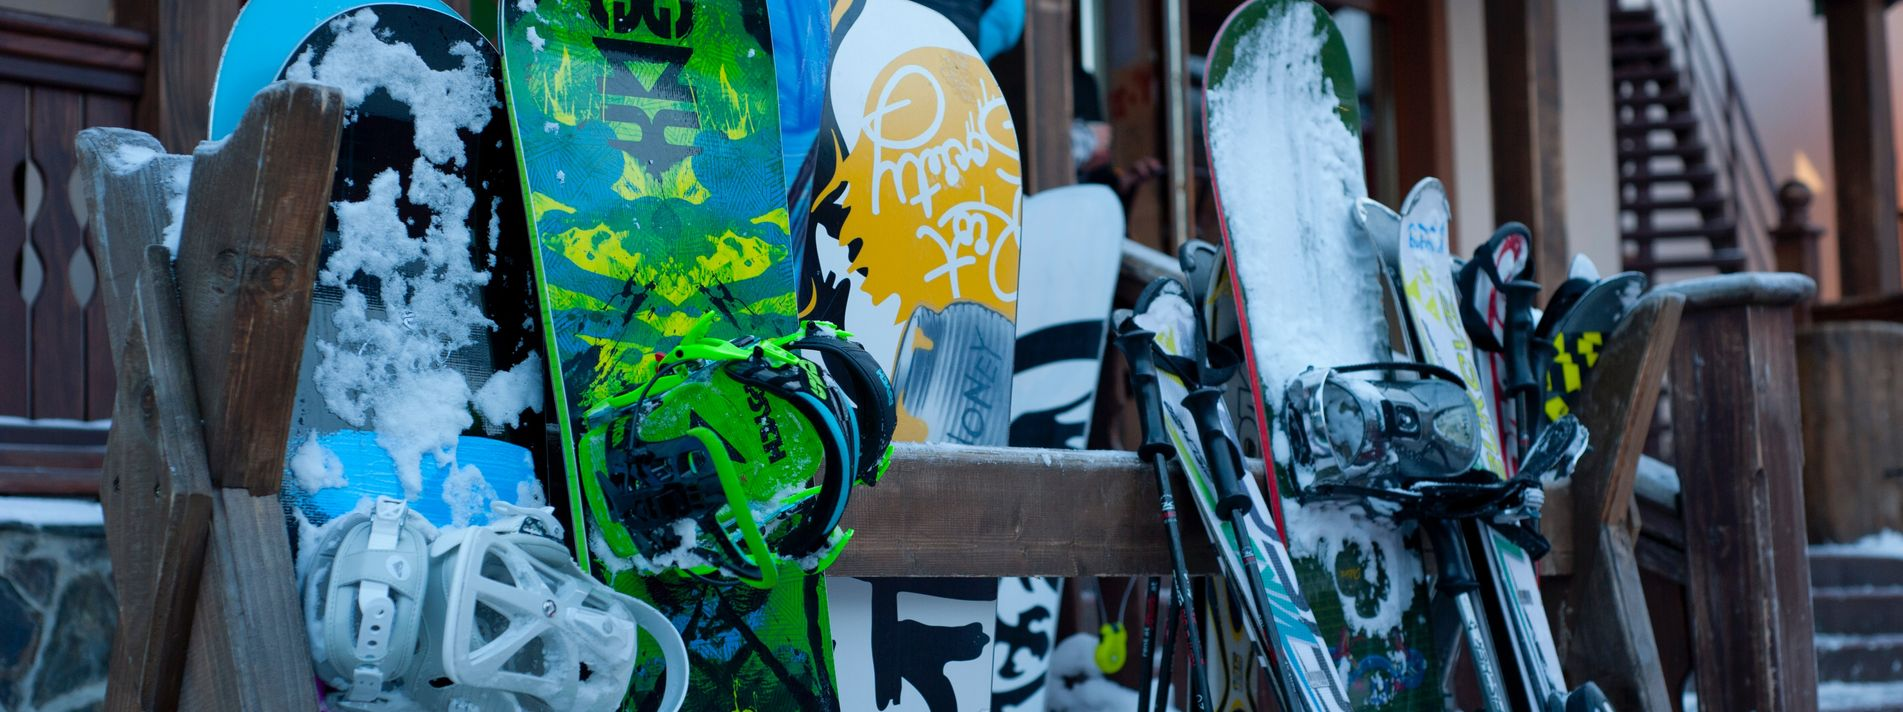 Echipament cursuri schi si snowboard | Sport Ski Club | Poiana Brasov